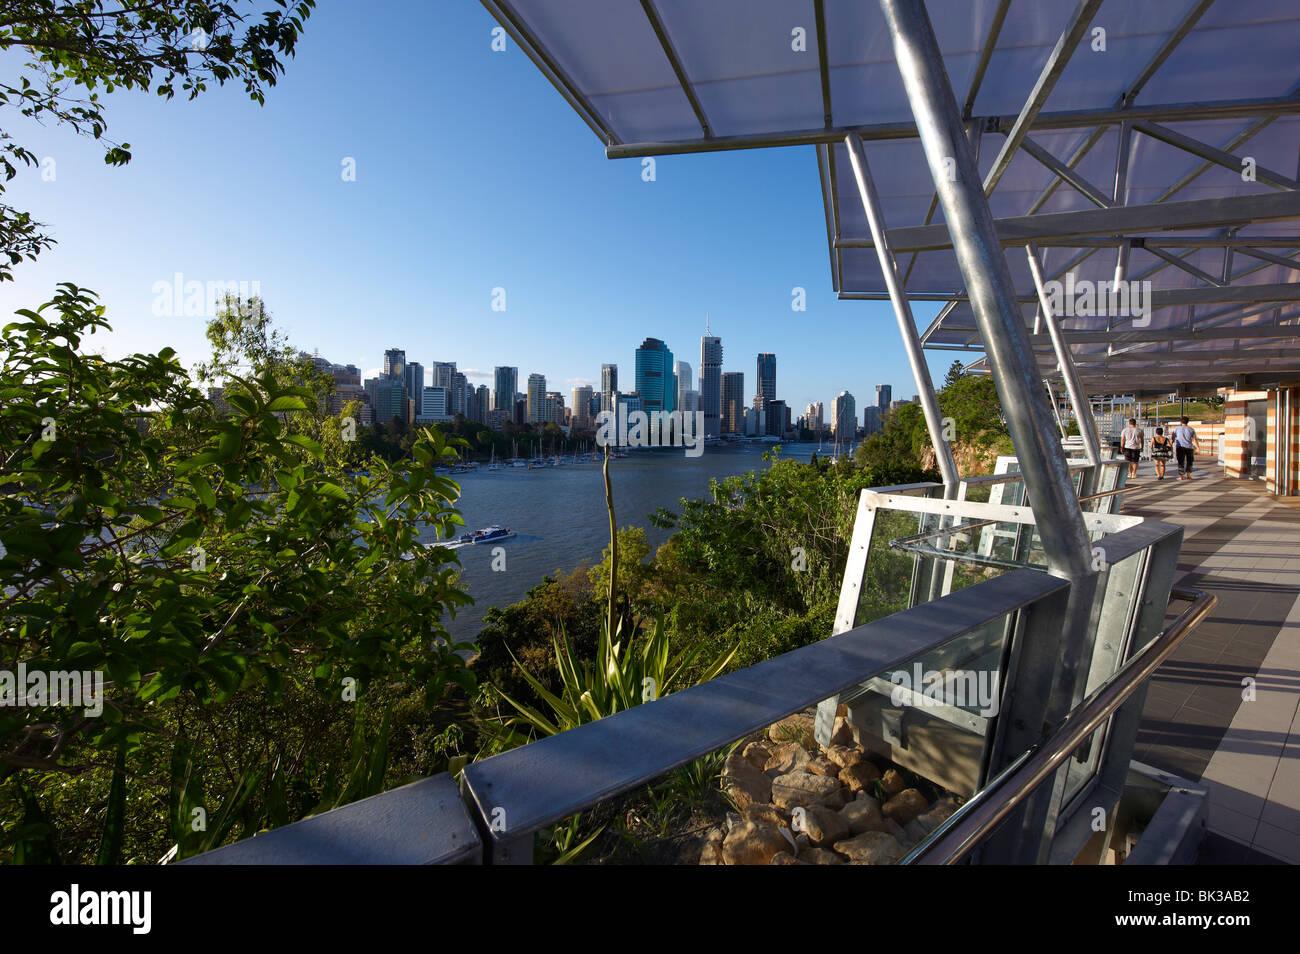 Kangaroo Point Park Brisbane Australia - Stock Image